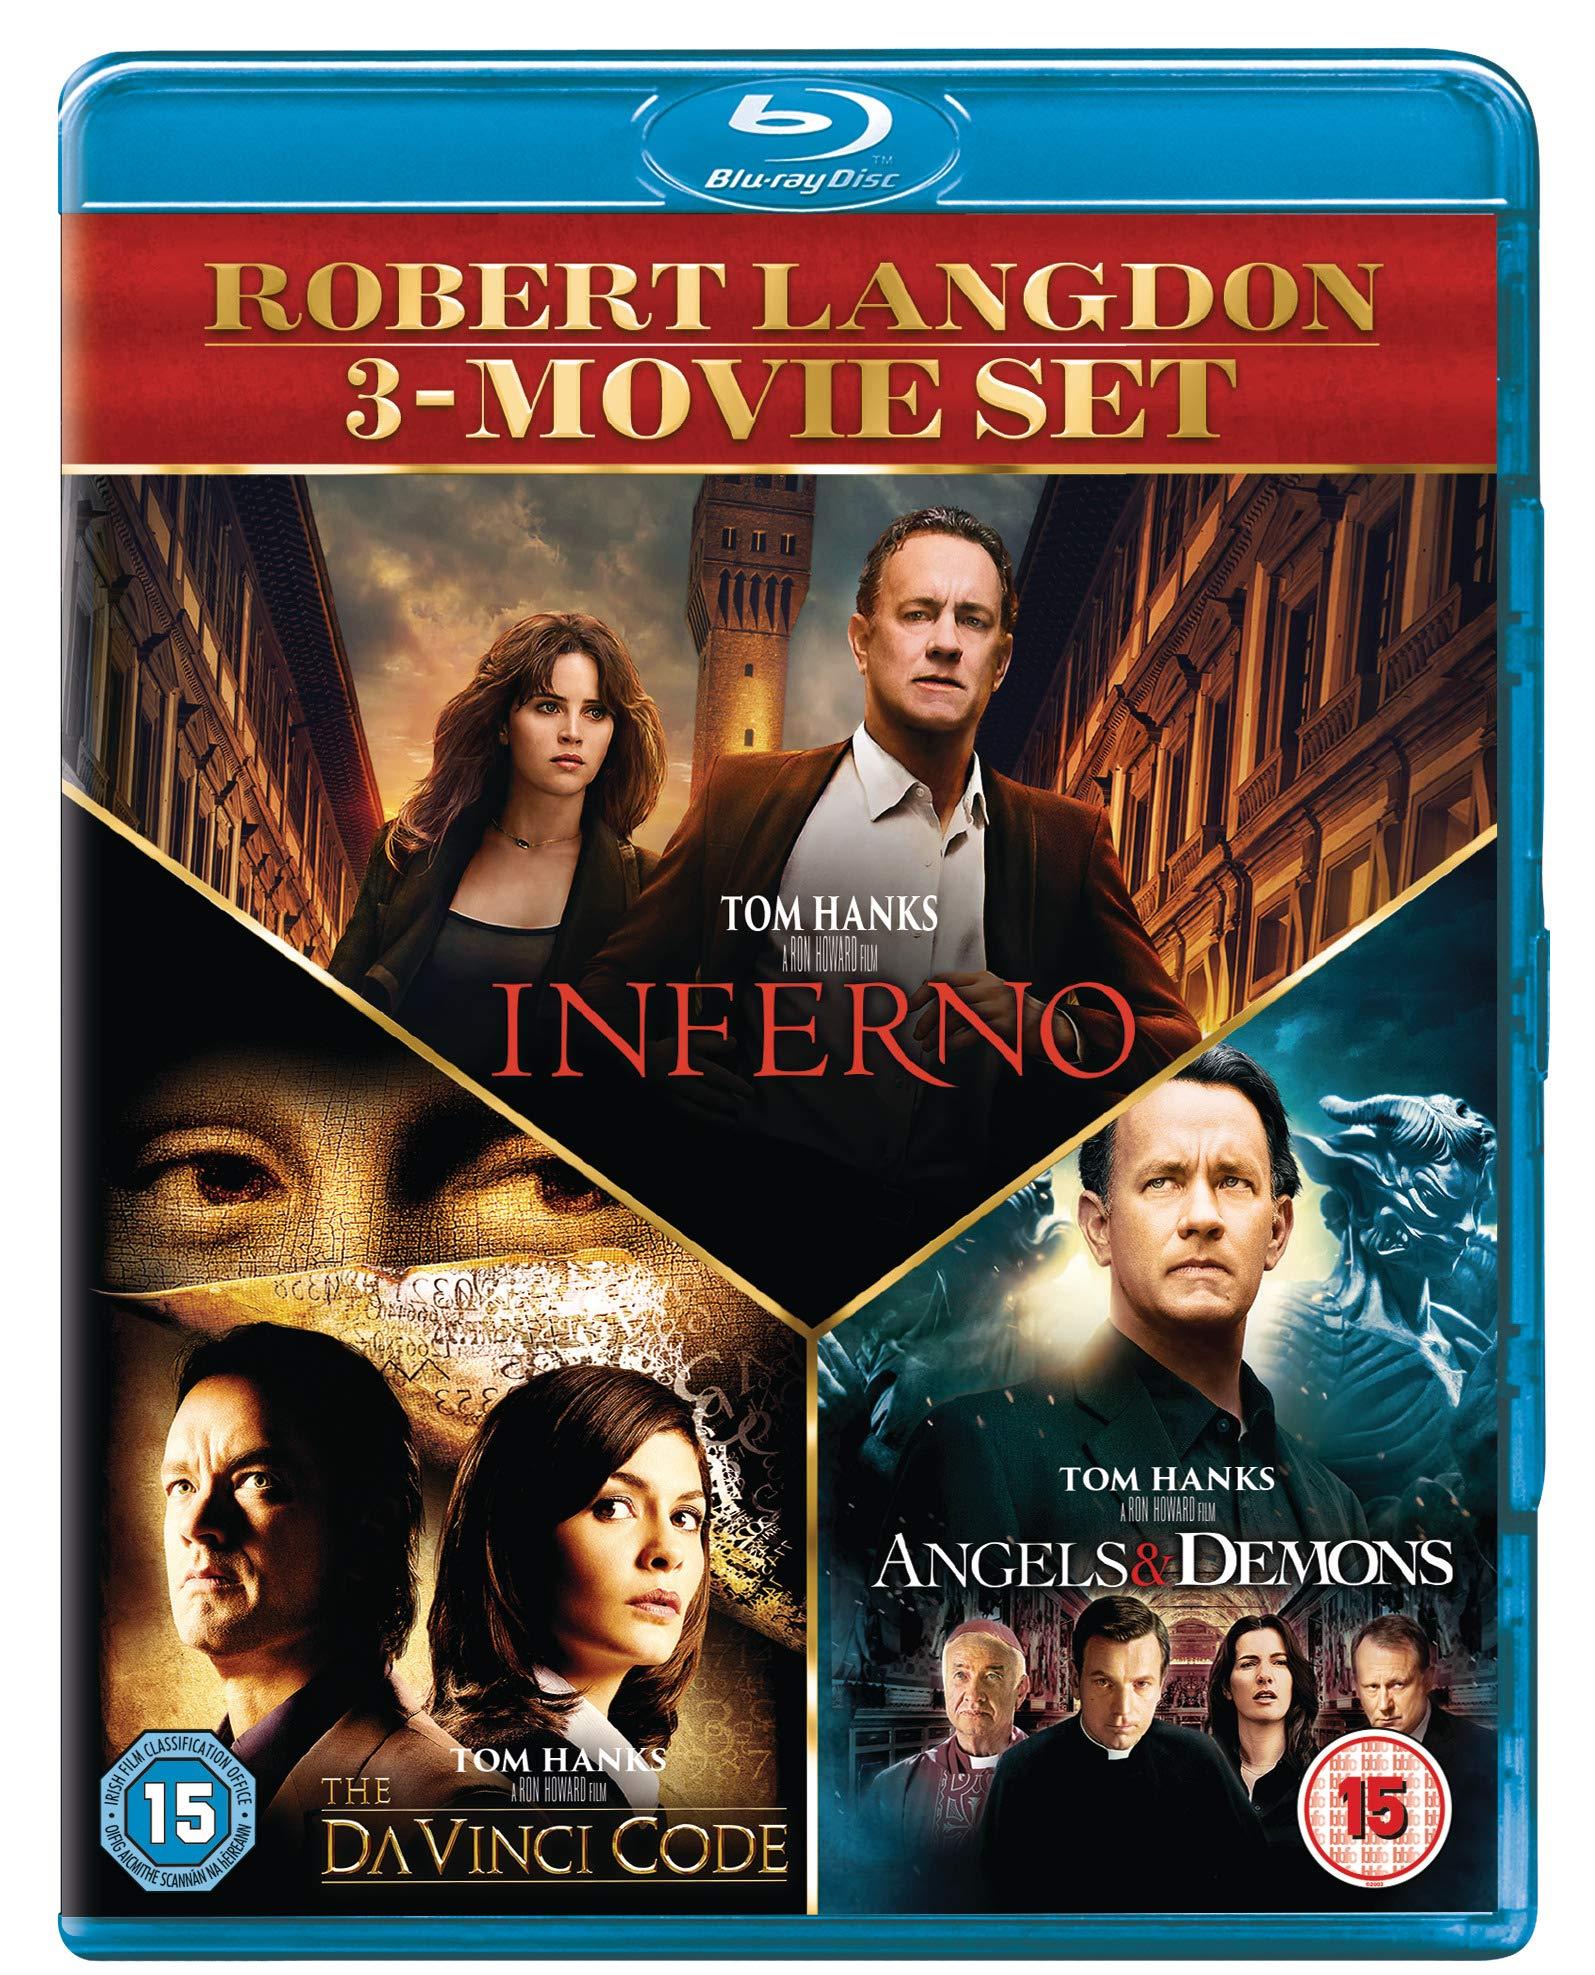 Inferno, Angels & Demons & Davinci Code Boxset [Blu-ray] [2019] [Region Free]